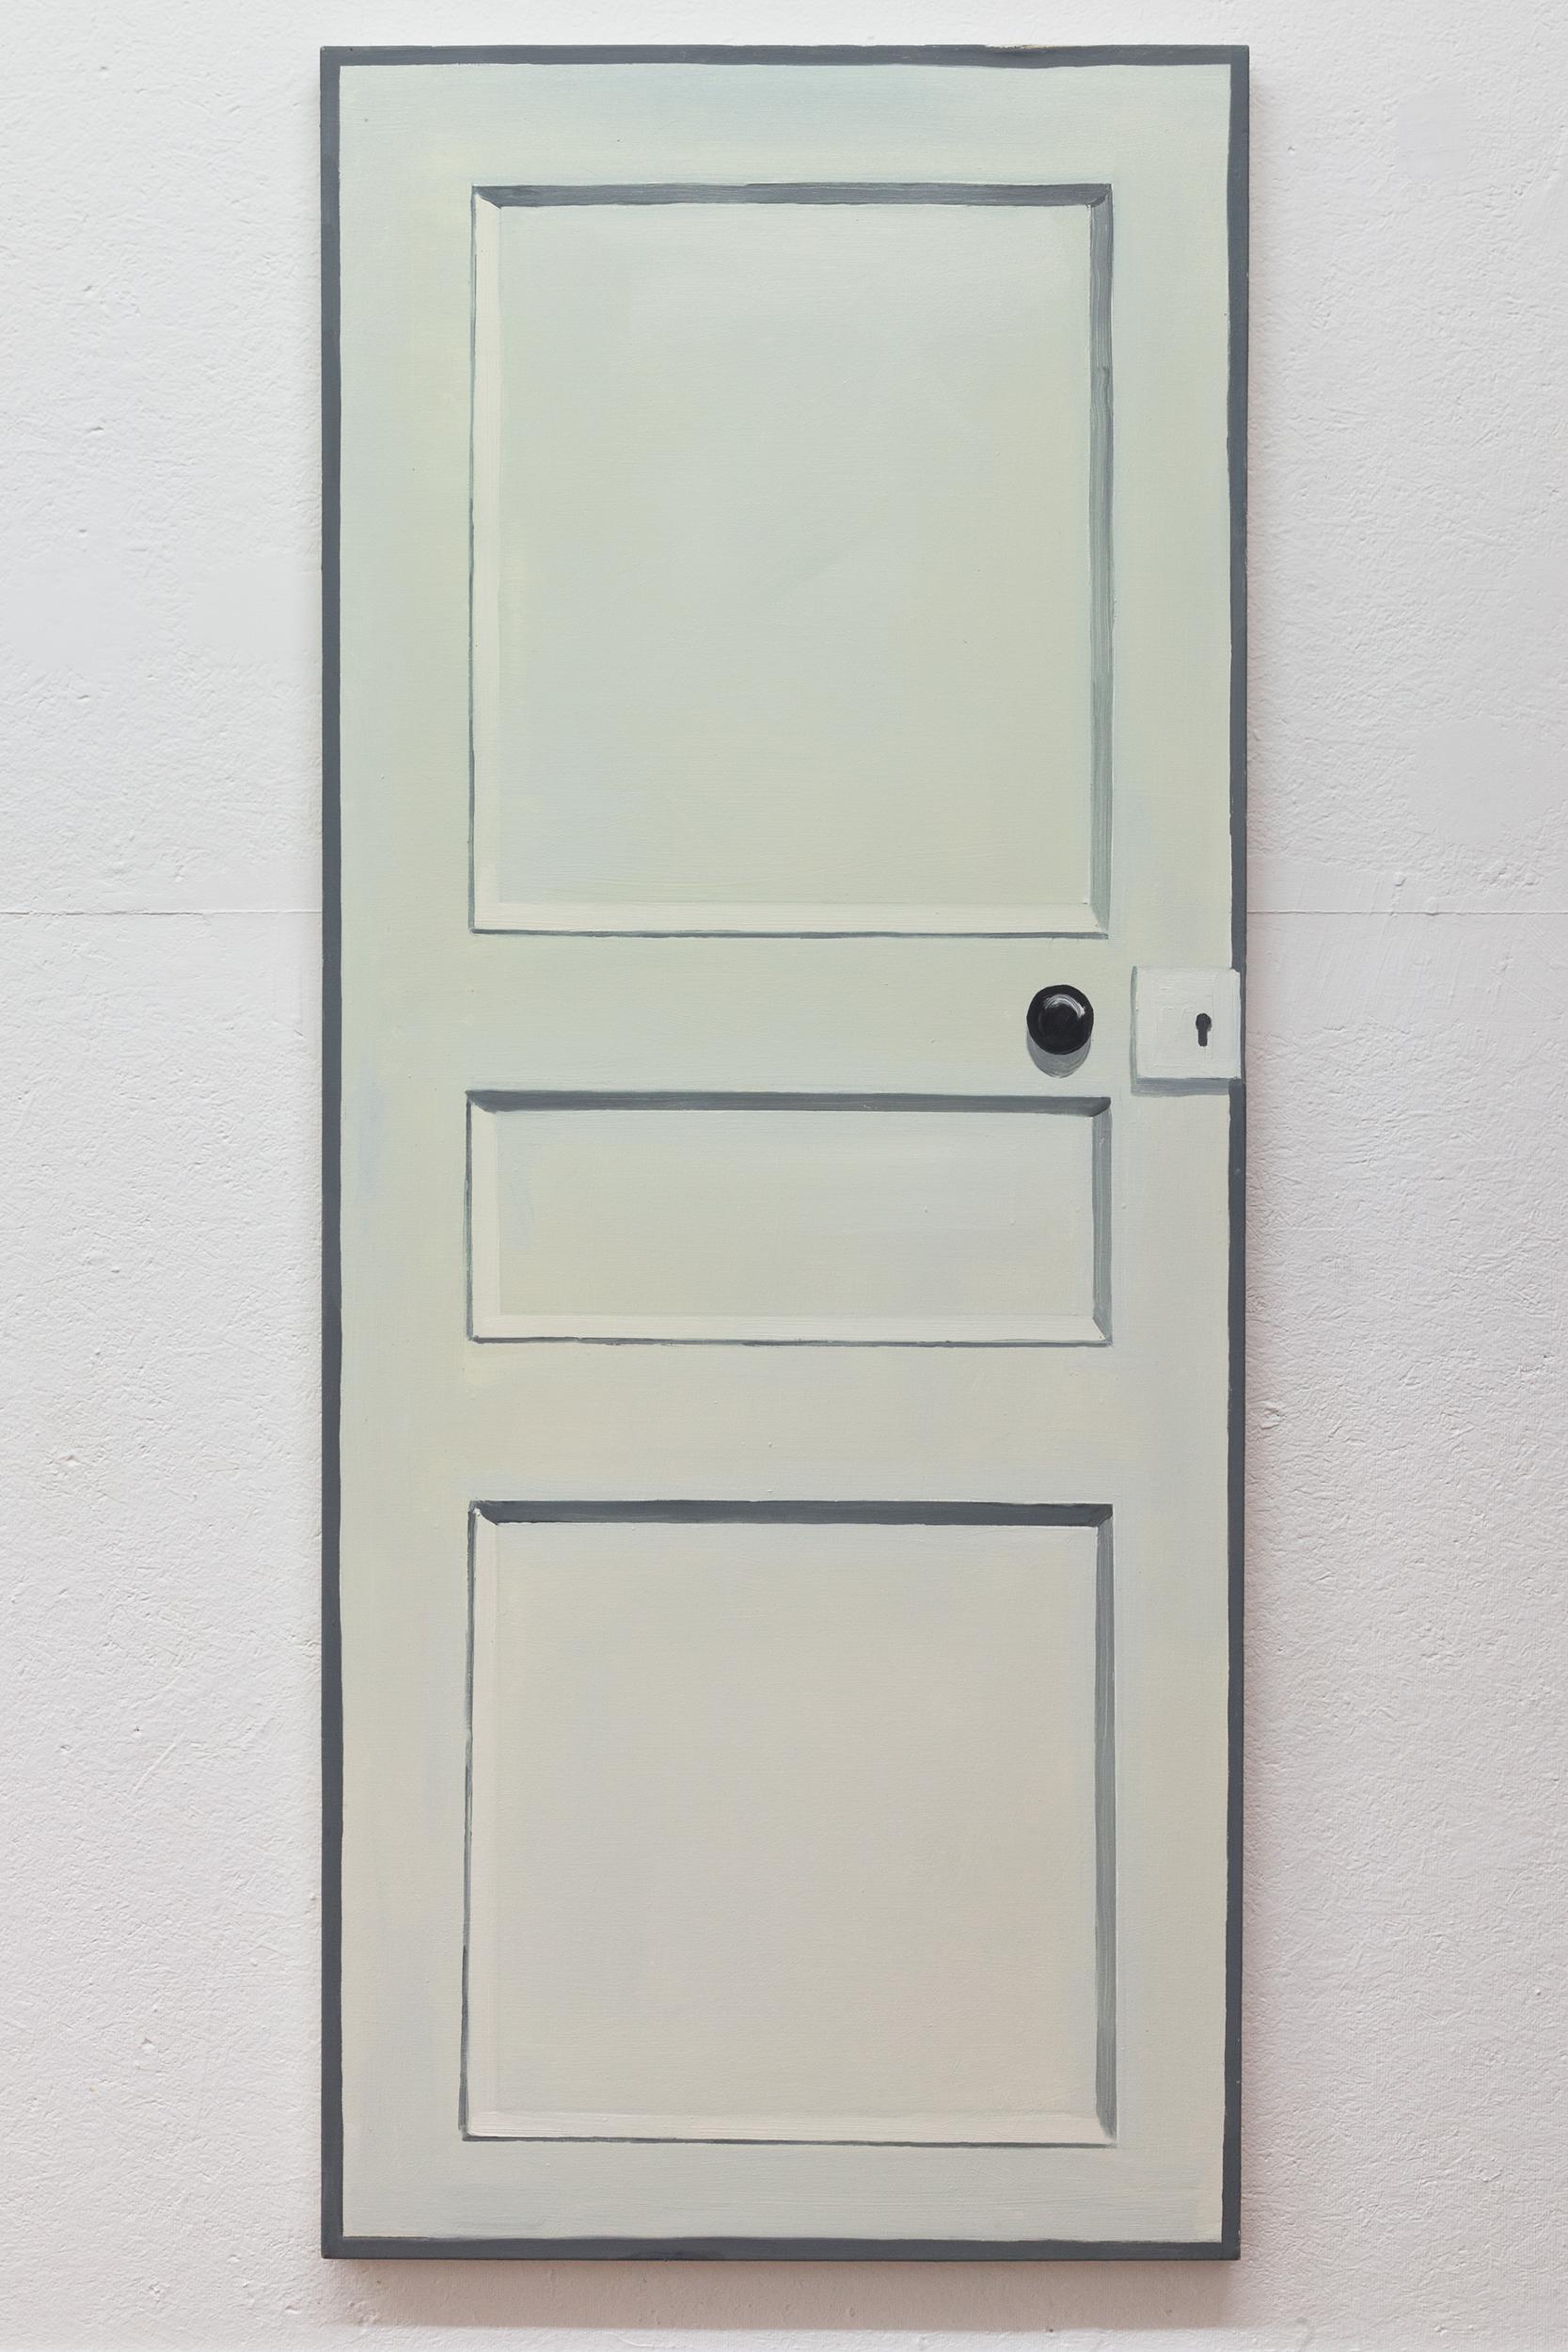 Richard Bosman,  Piet Mondrian Door , 2016, Oil on canvas, 72 x 30 inches